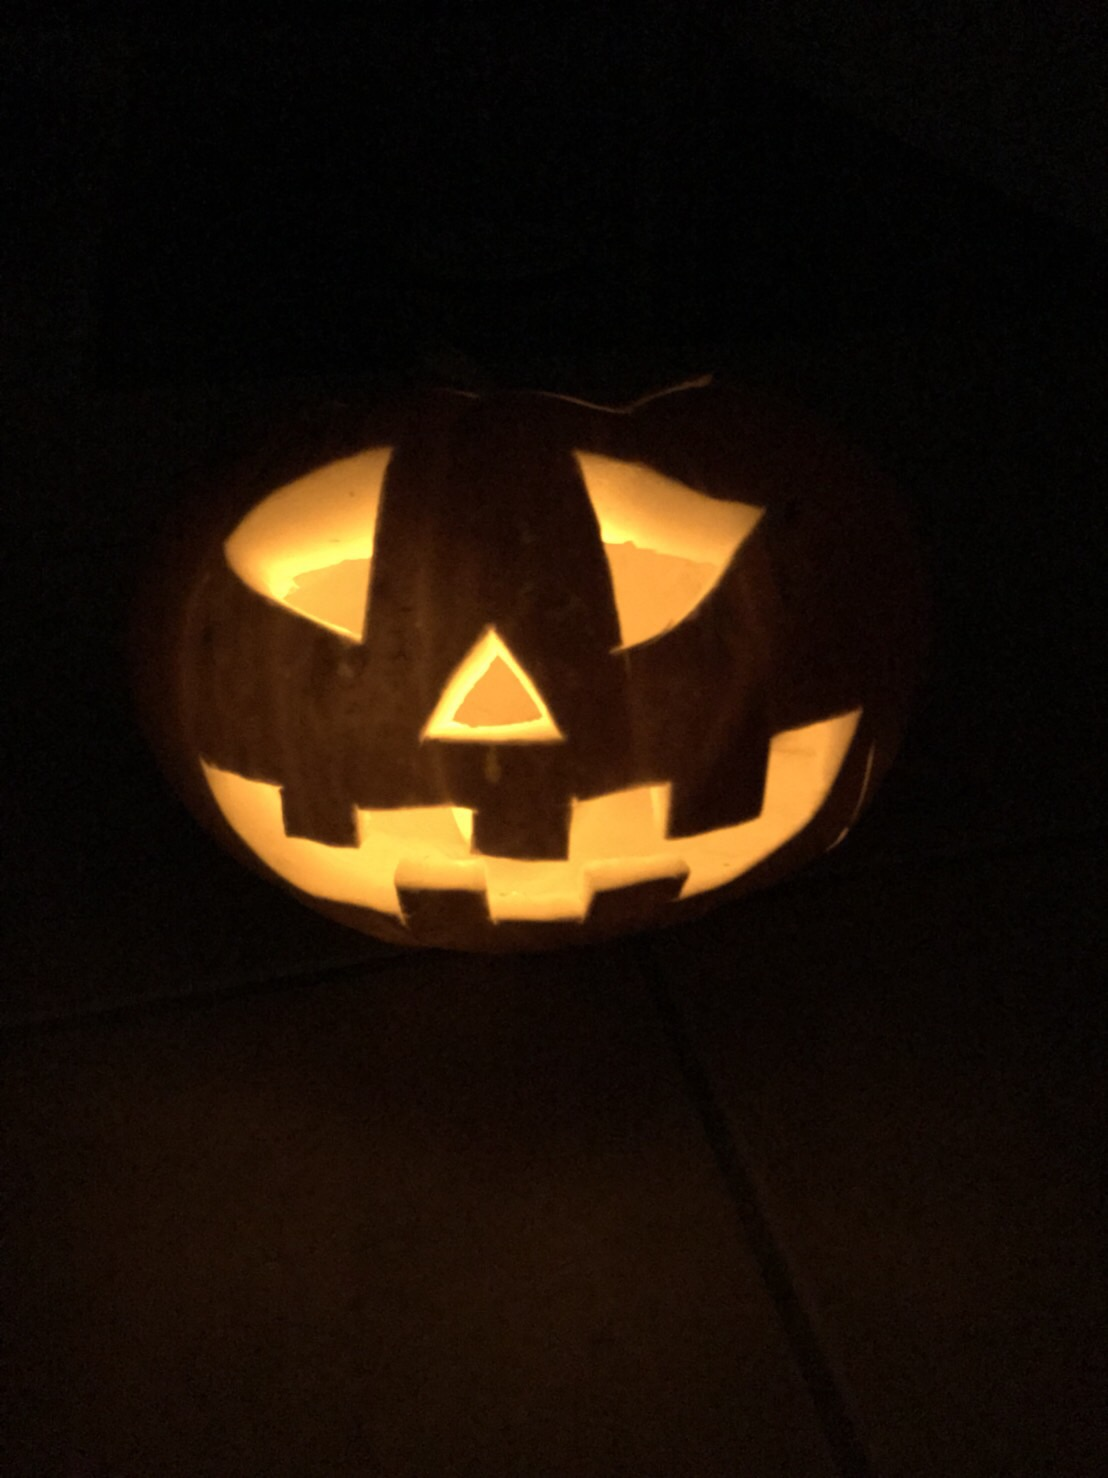 house pumpkin.JPG